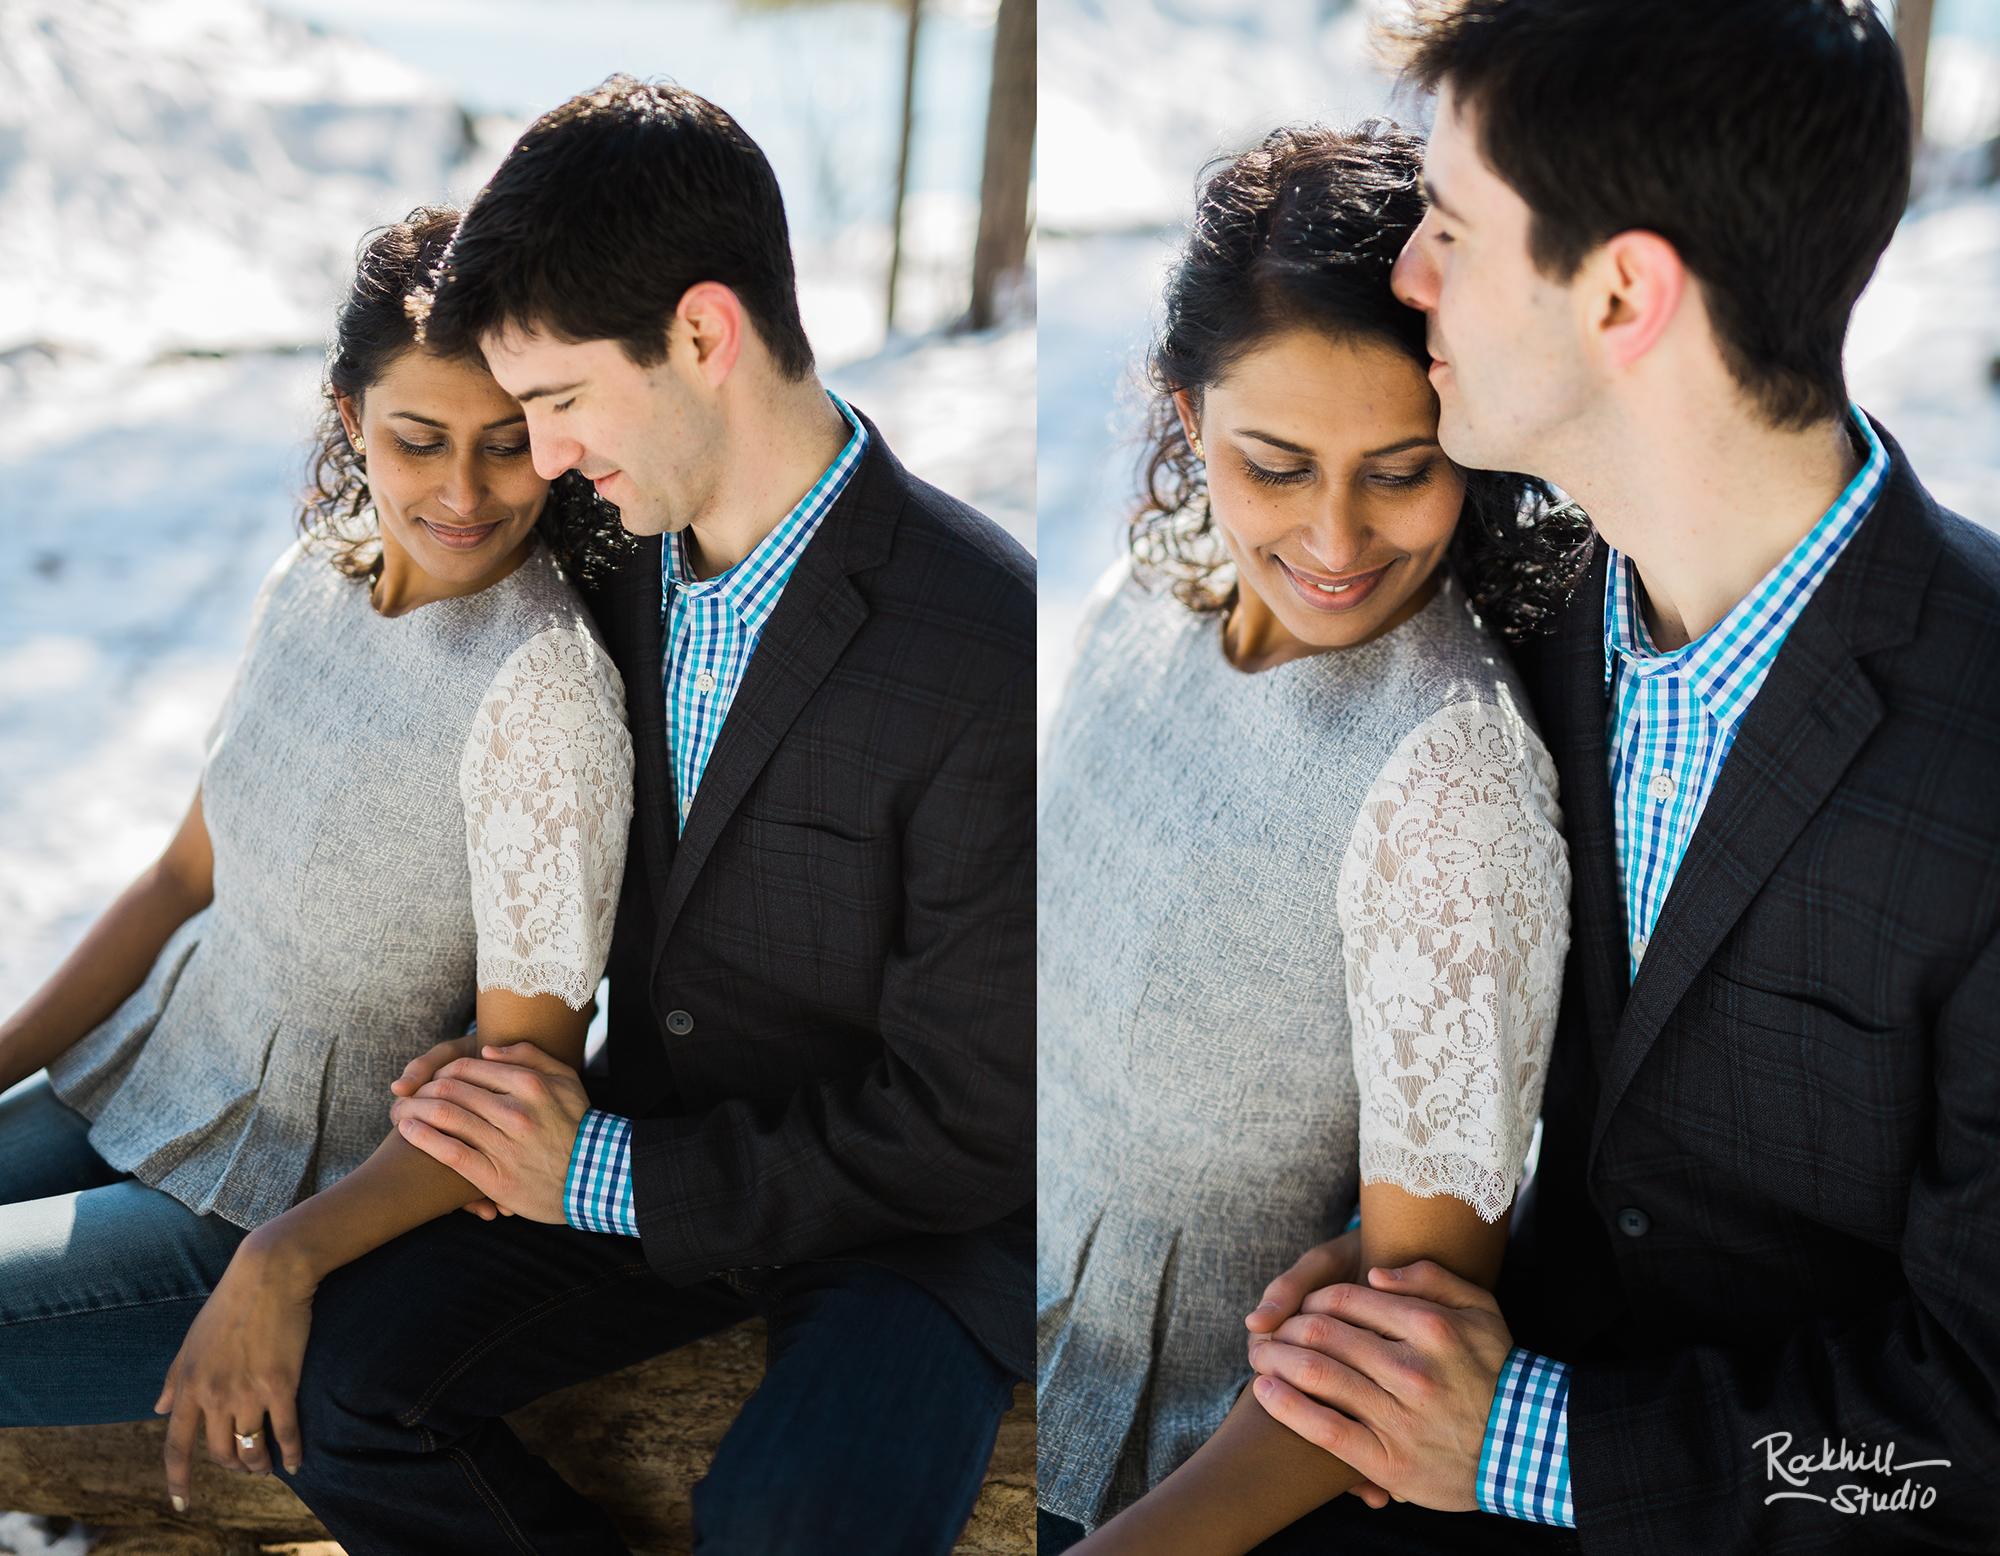 northern-michigan-wedding-marquette-engagement-upper-peninsula-michigan-rockhill-winter-33.jpg